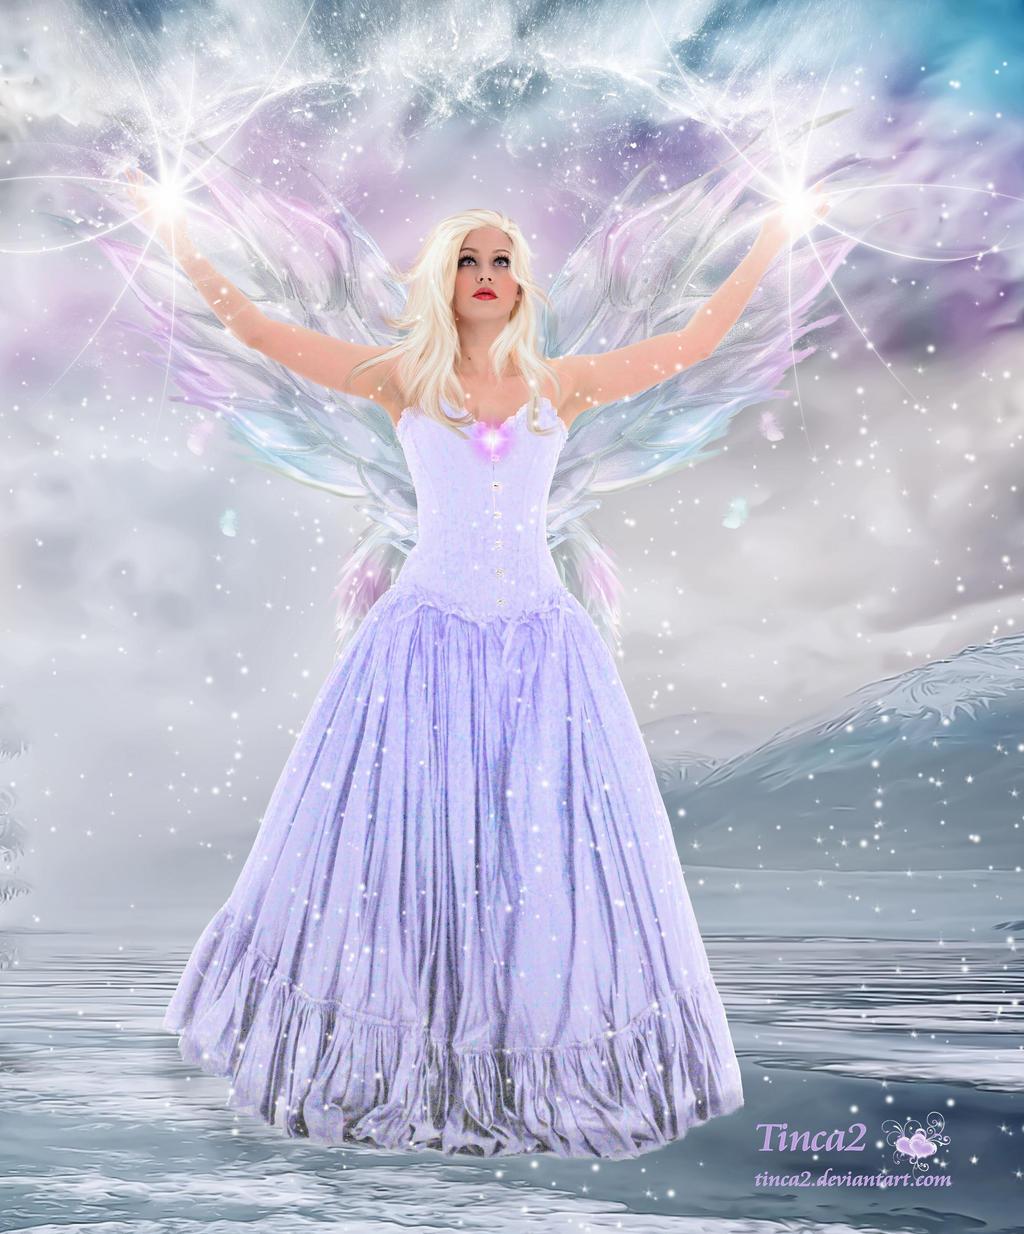 Winter Magic by tinca2